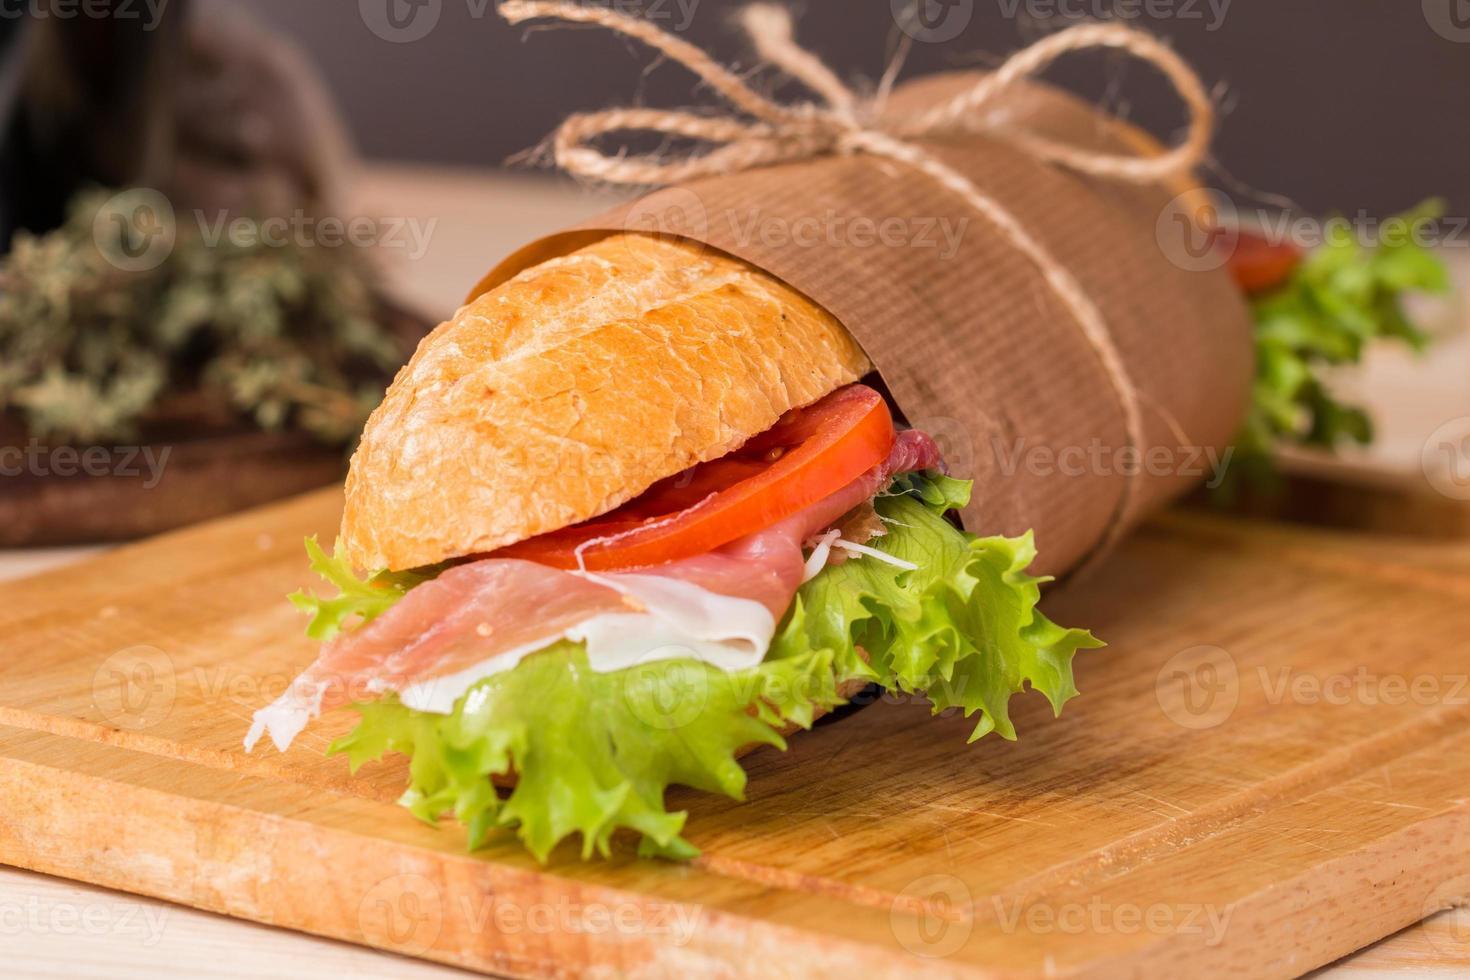 sandwich from fresh baguette photo